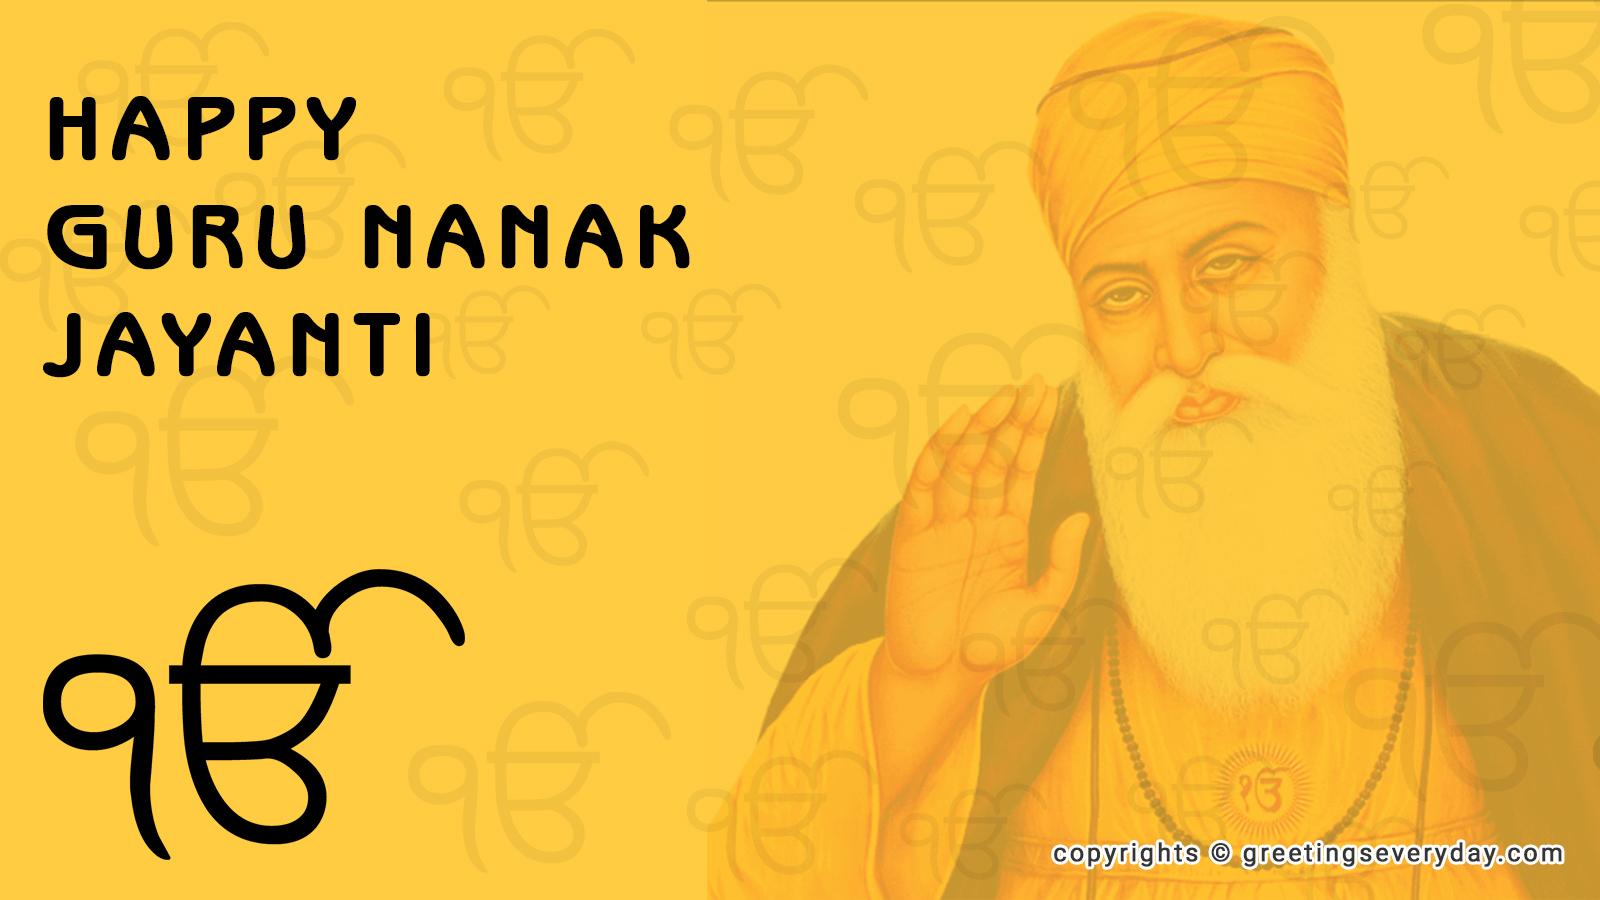 Guru Nanak Jayanti HD Wallpapers For Desktop Background